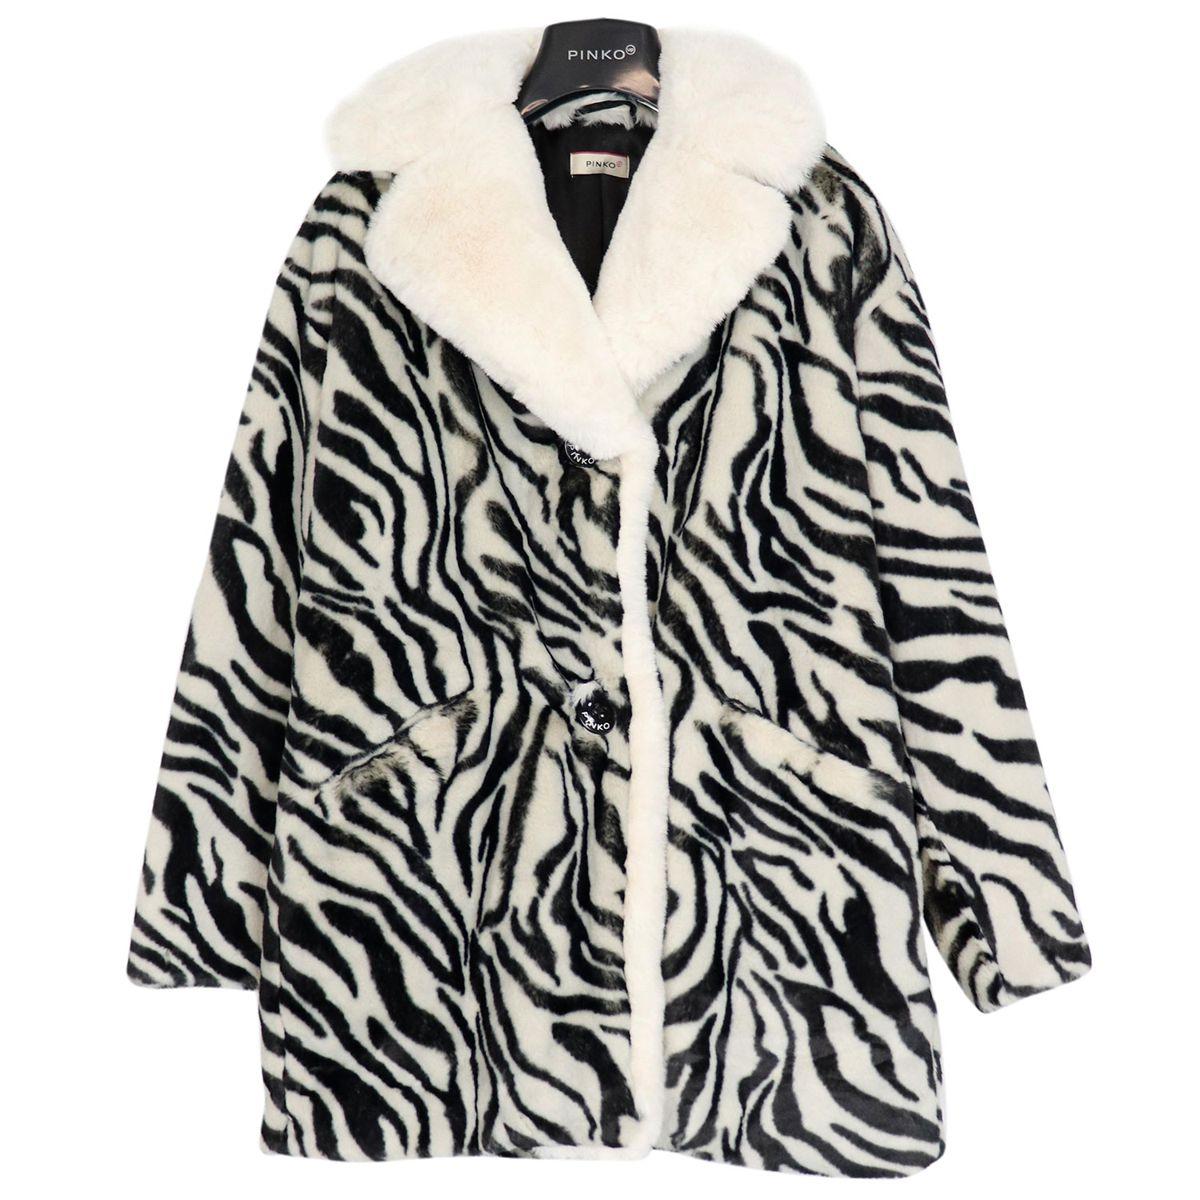 Eco-fur notary coat Zebra print Pinko